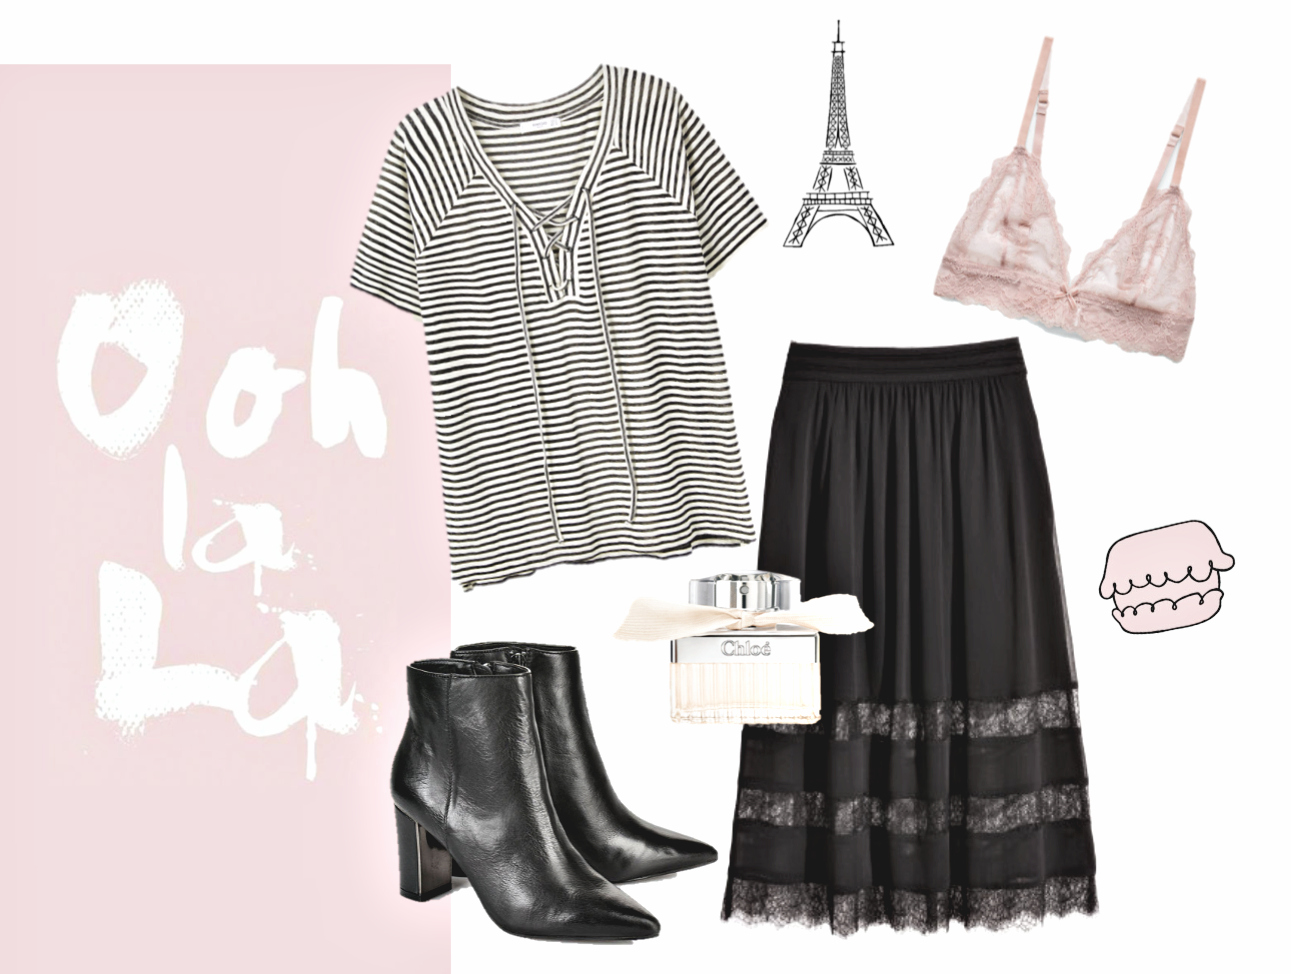 French-Style-Stil-Mango-Shirt-Spitzen-Rock-H&M-Ankleboots-Buffalo-Chloé-Parfum-Spitzen-BH-Bustier-Mango-Rosé-Paris-Travel